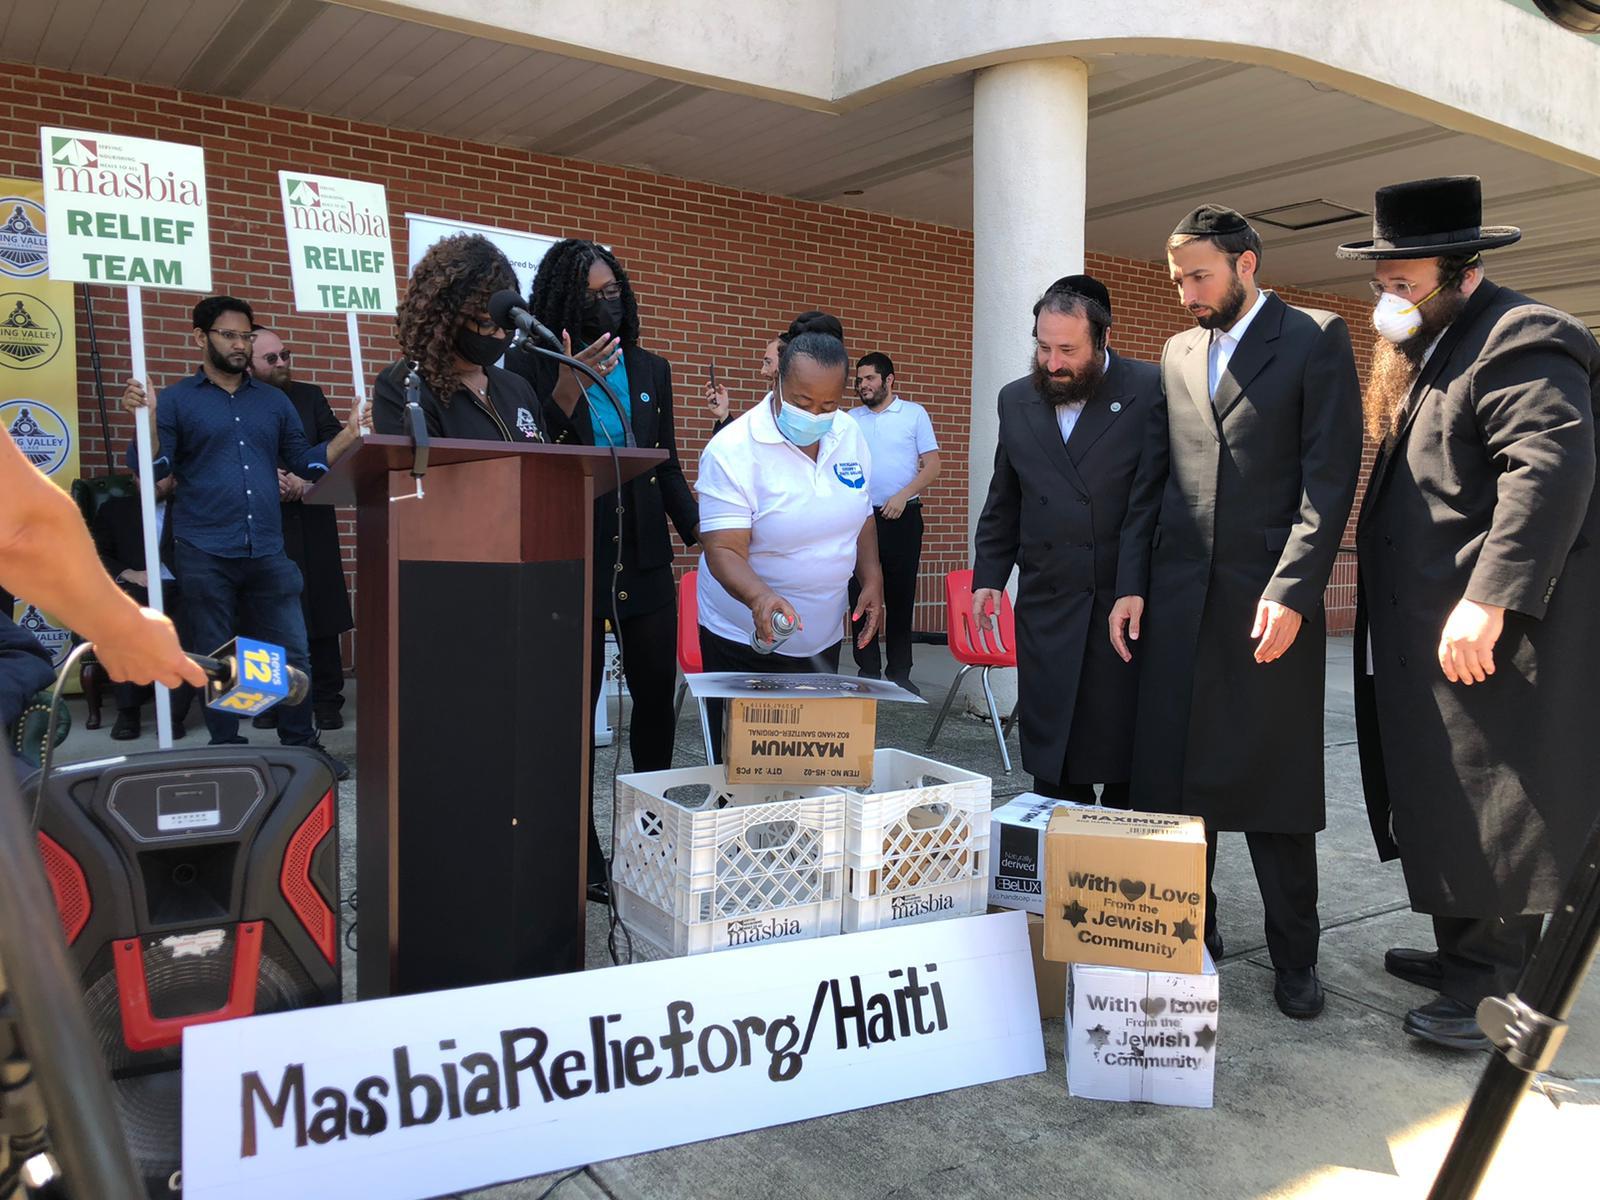 NY's Jewish Community to give food, aid to 2021 Haiti earthquake victims